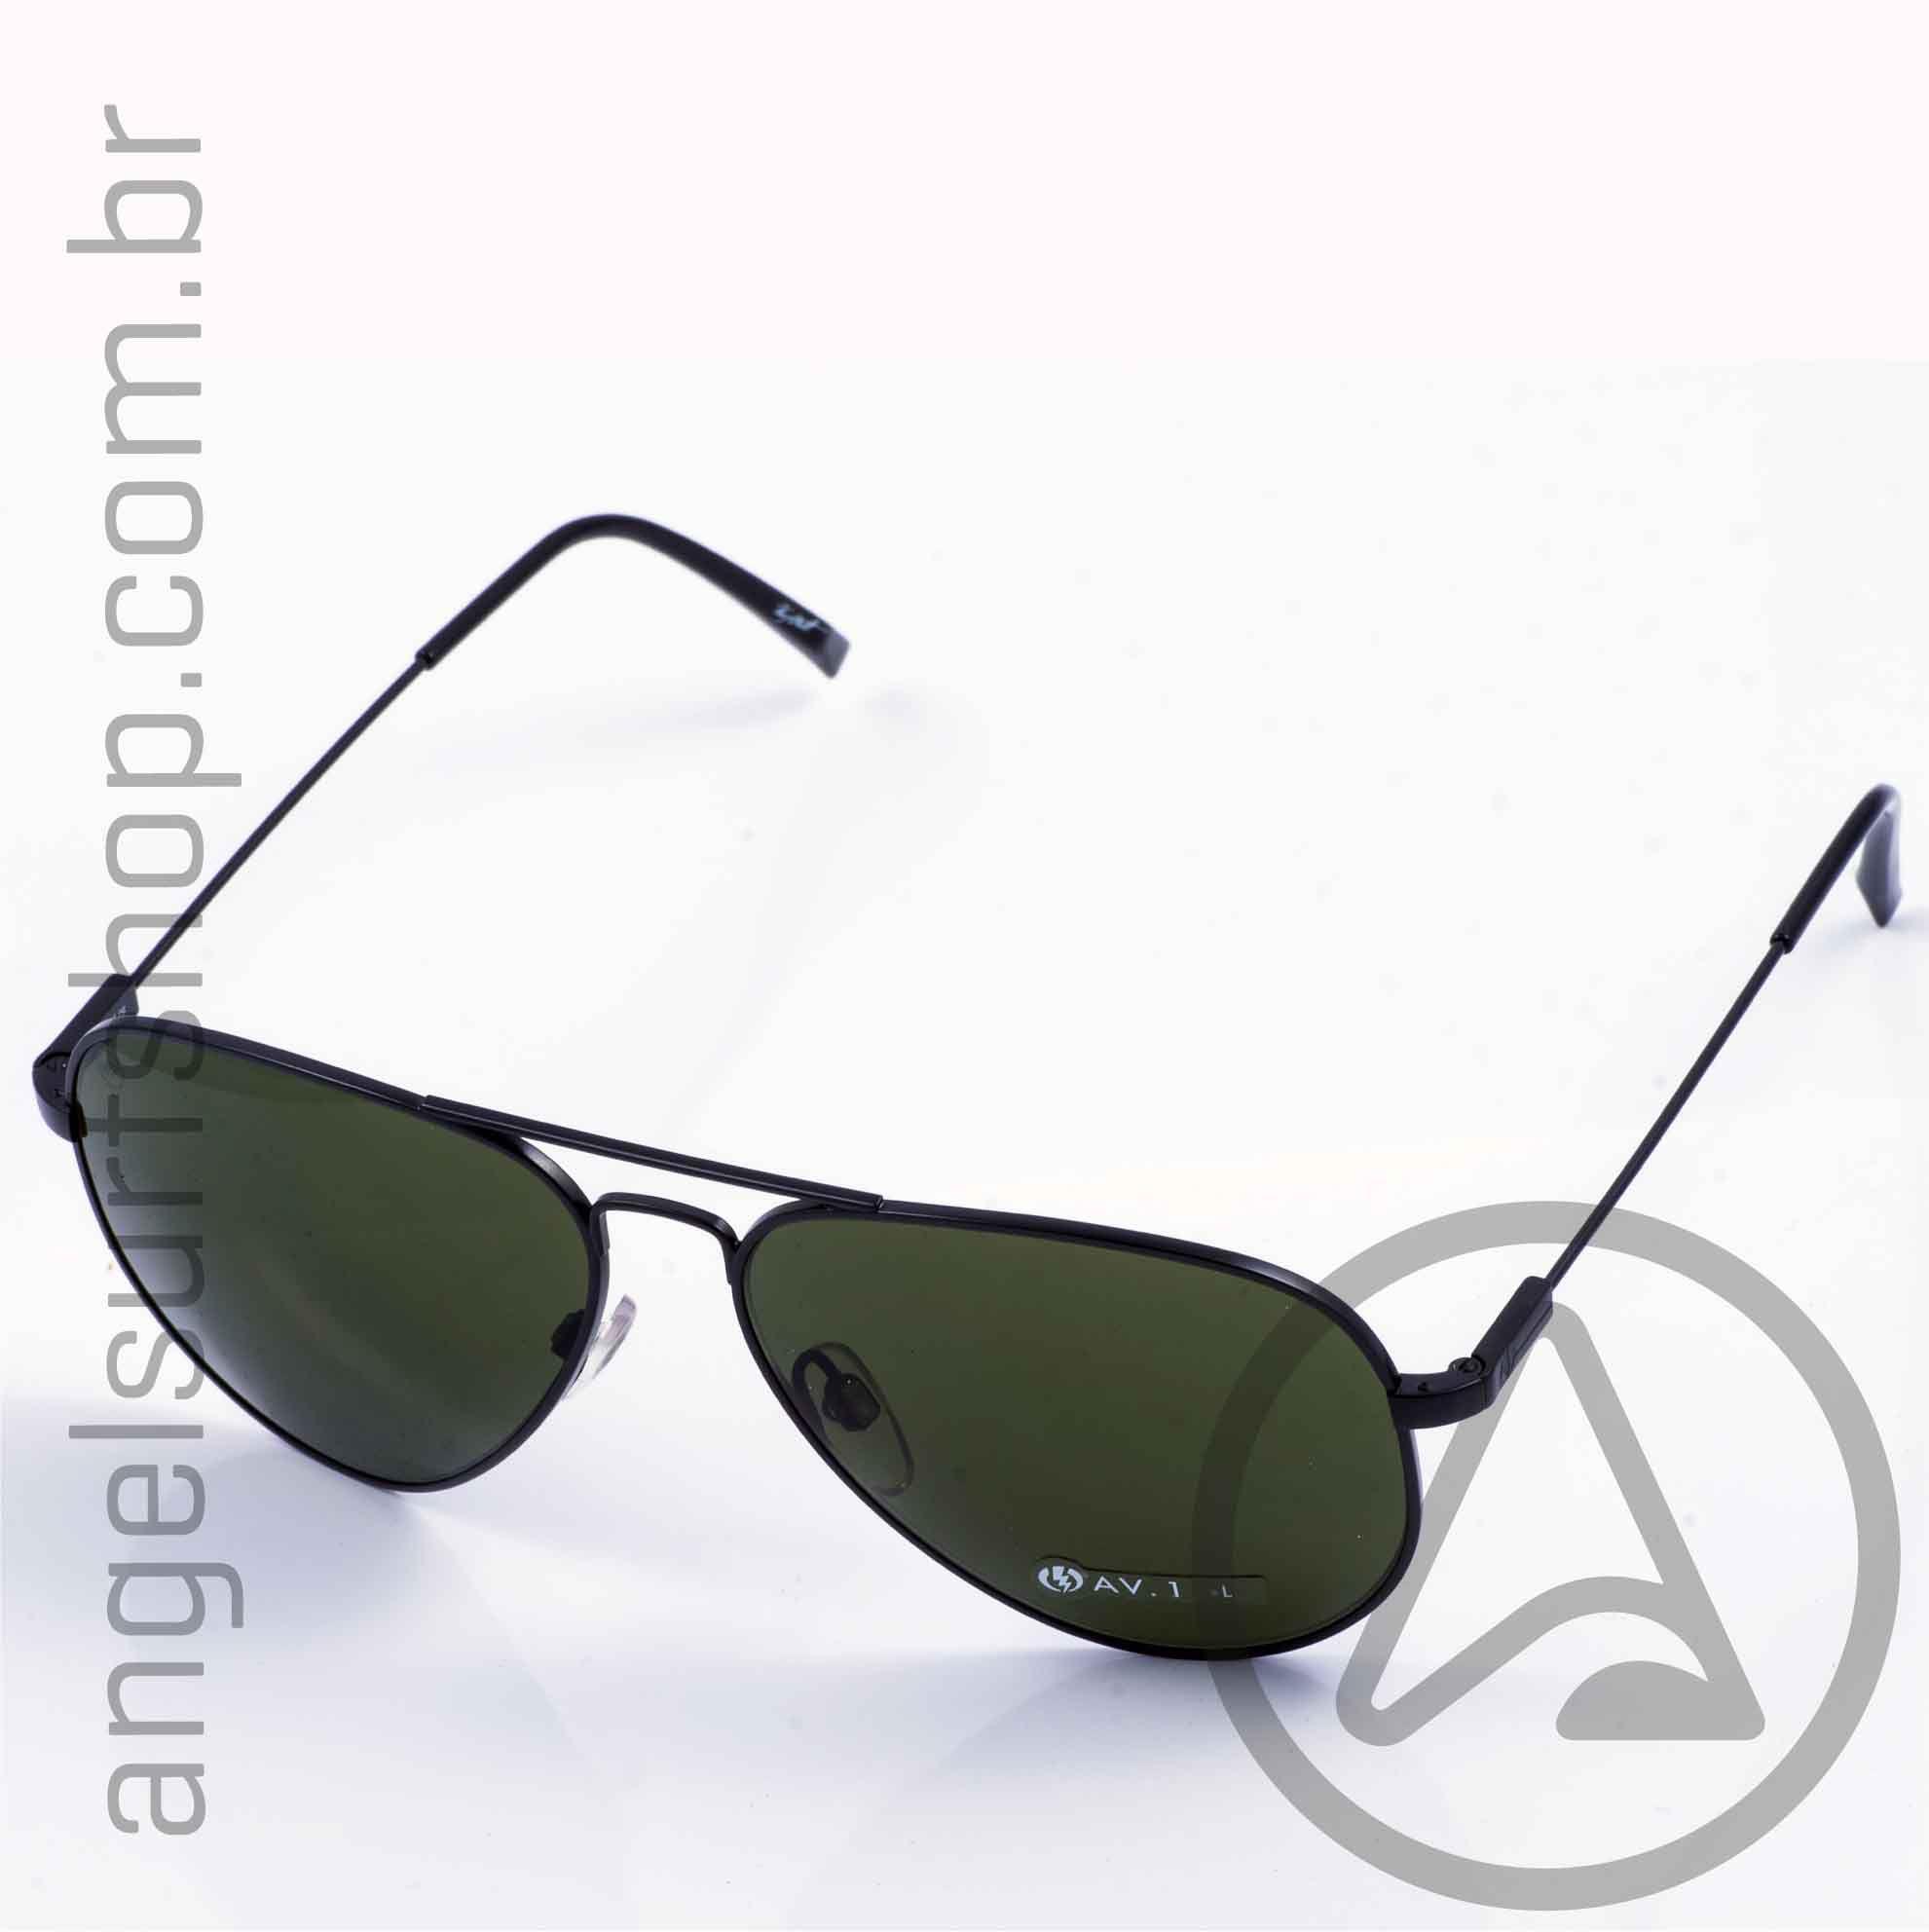 Sunglass Electric AV1 Large Black M Grey (UNISSEX)